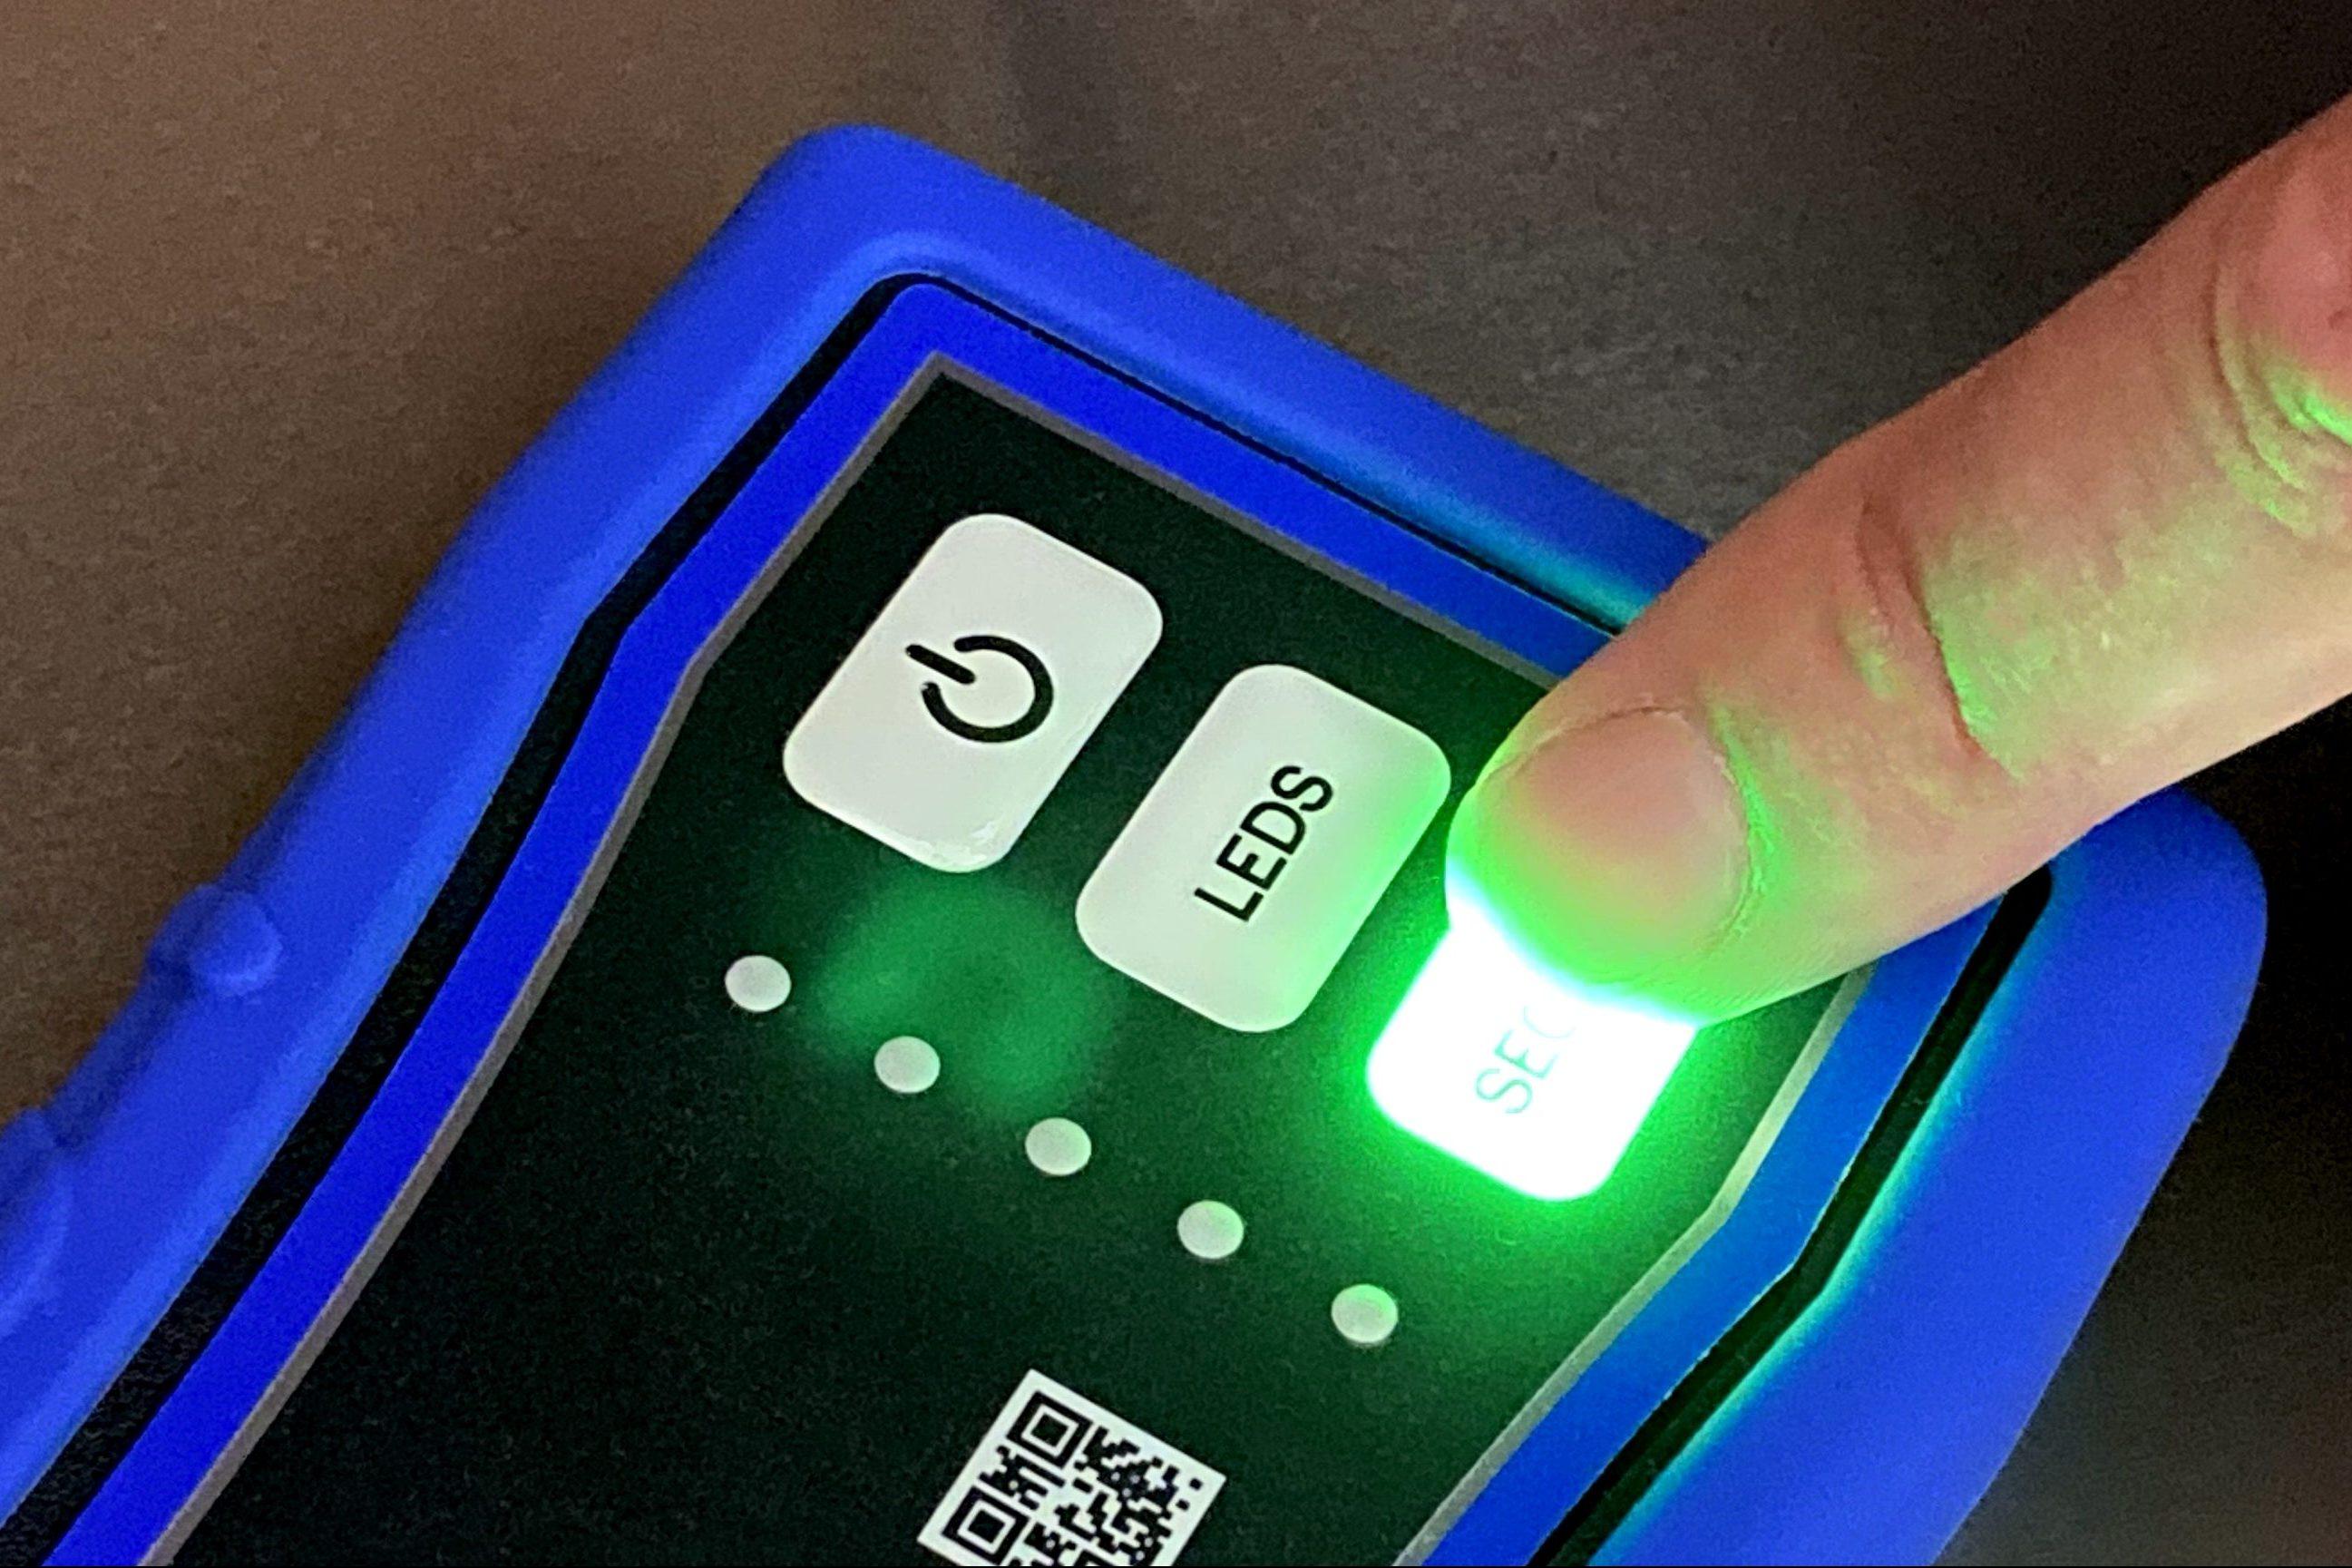 Backlighting - Green LED with finger